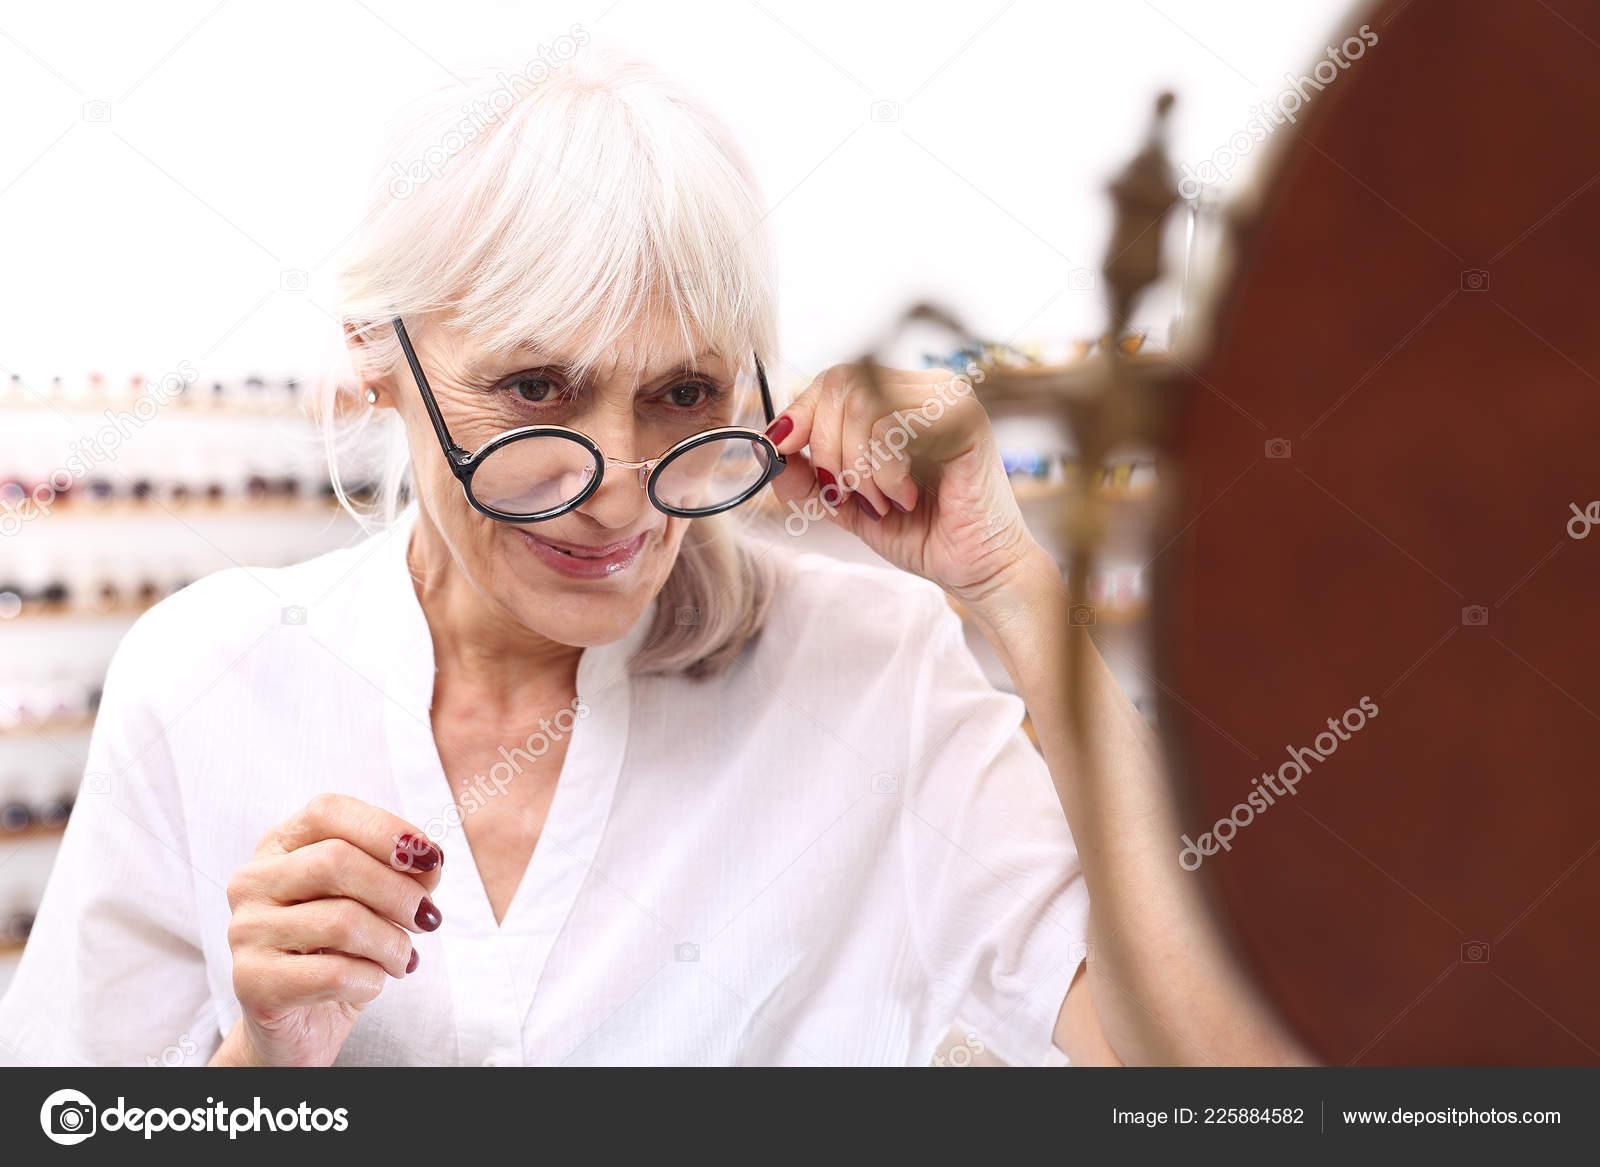 c0ad2a7a02 Γυαλιά Για Μια Γριά Μια Ηλικιωμένη Γυναίκα Ένα Οπτικό Σαλόνι– εικόνα αρχείου